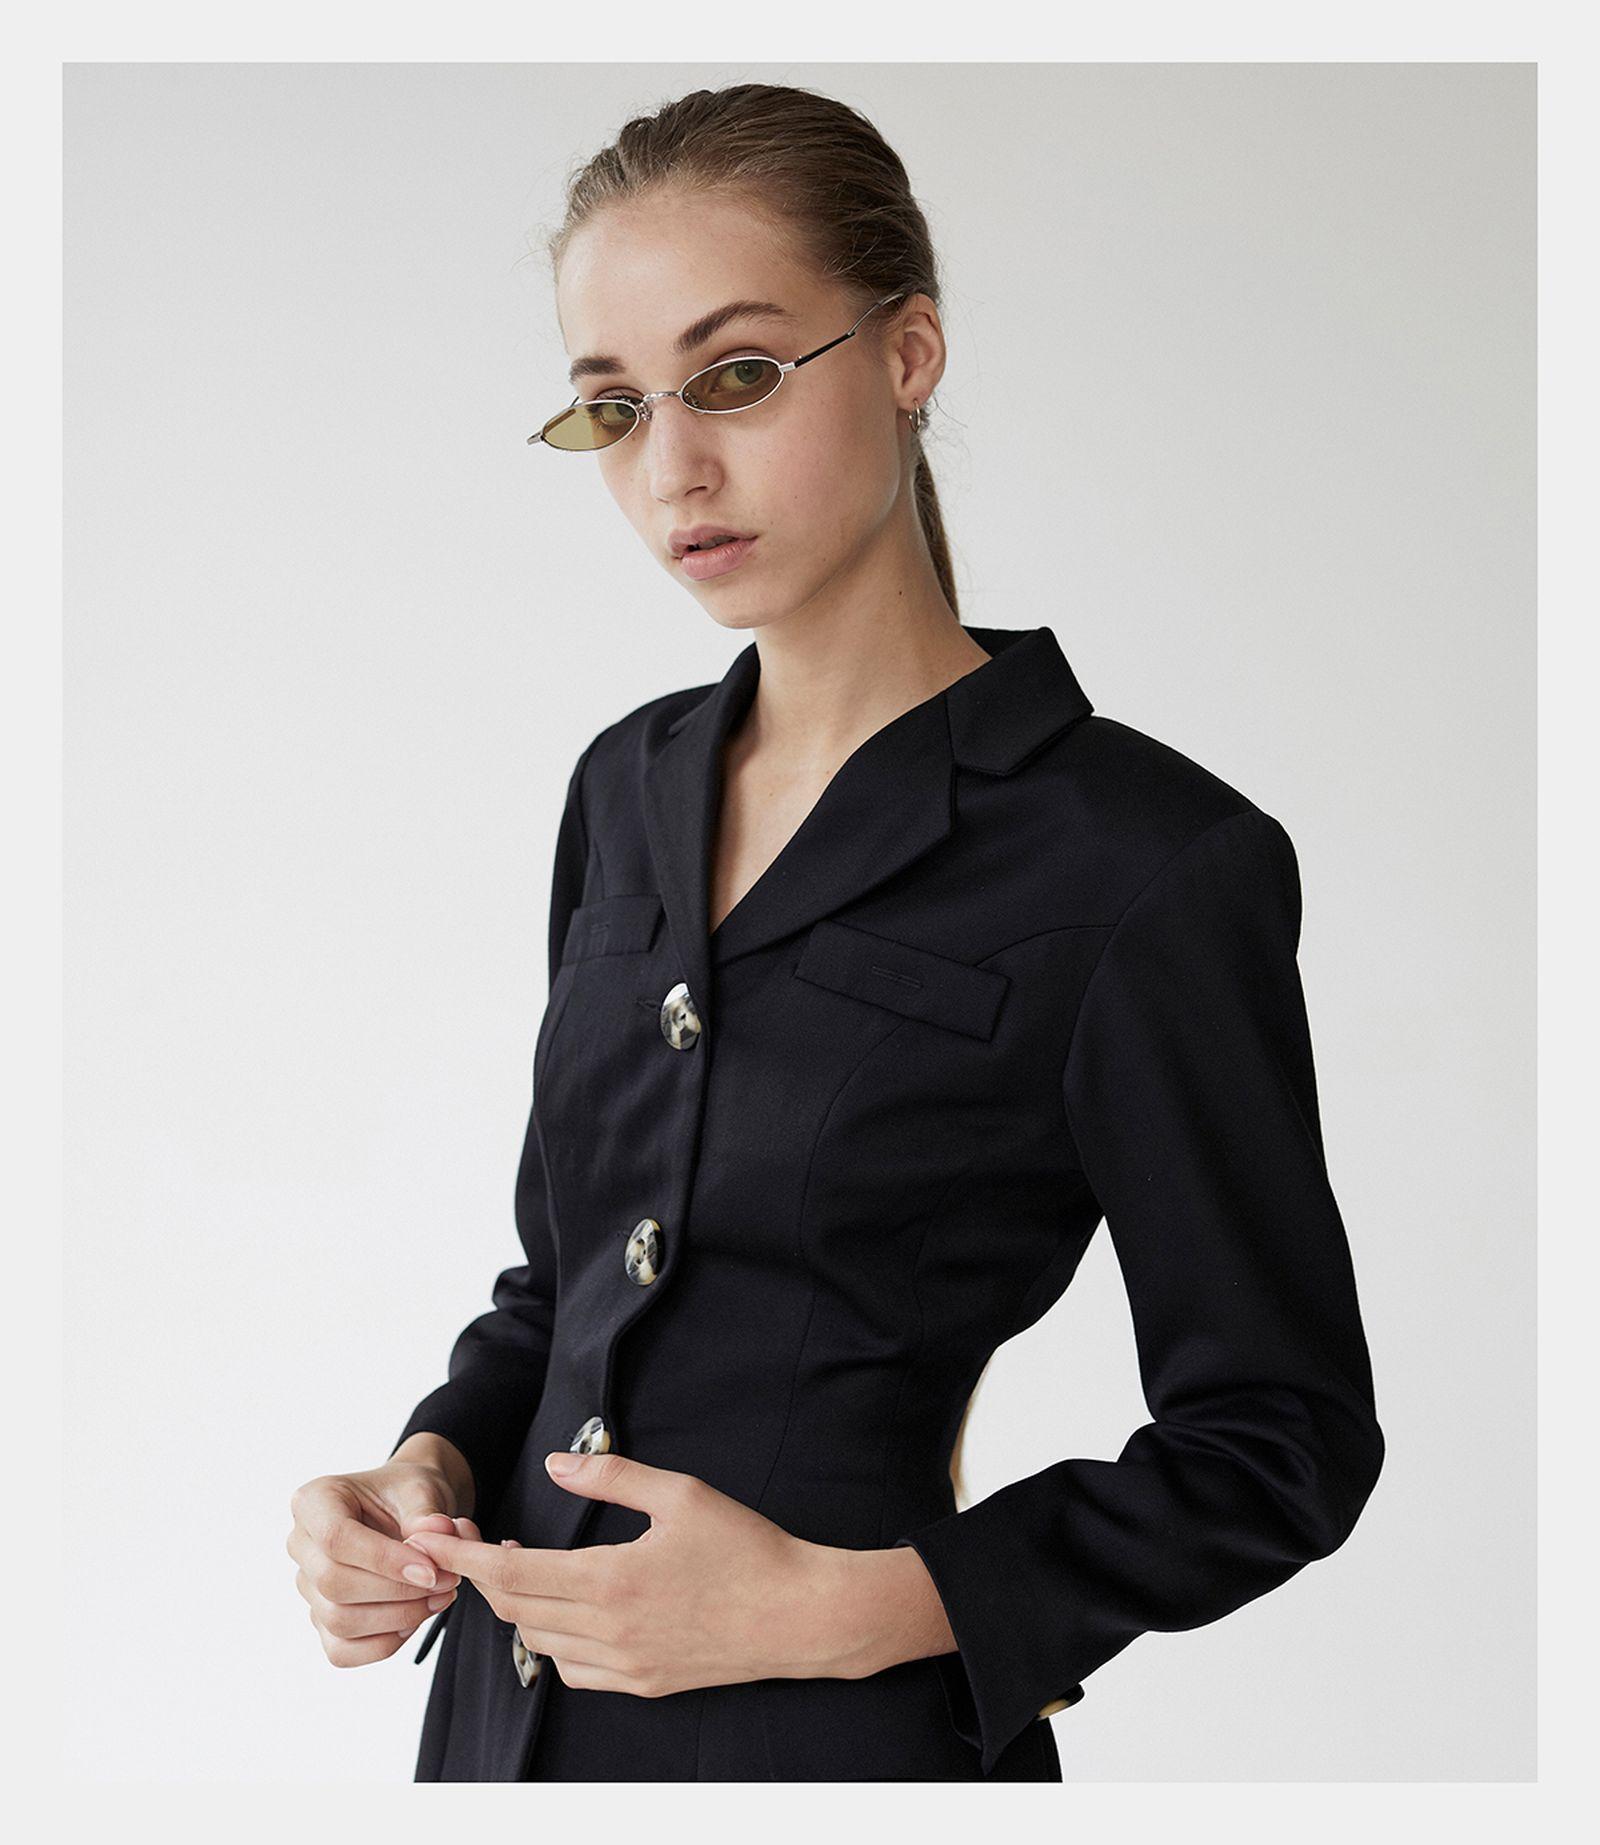 Suit: STEVO O' SMITH. Sunglasses GENTLE MONSTER.